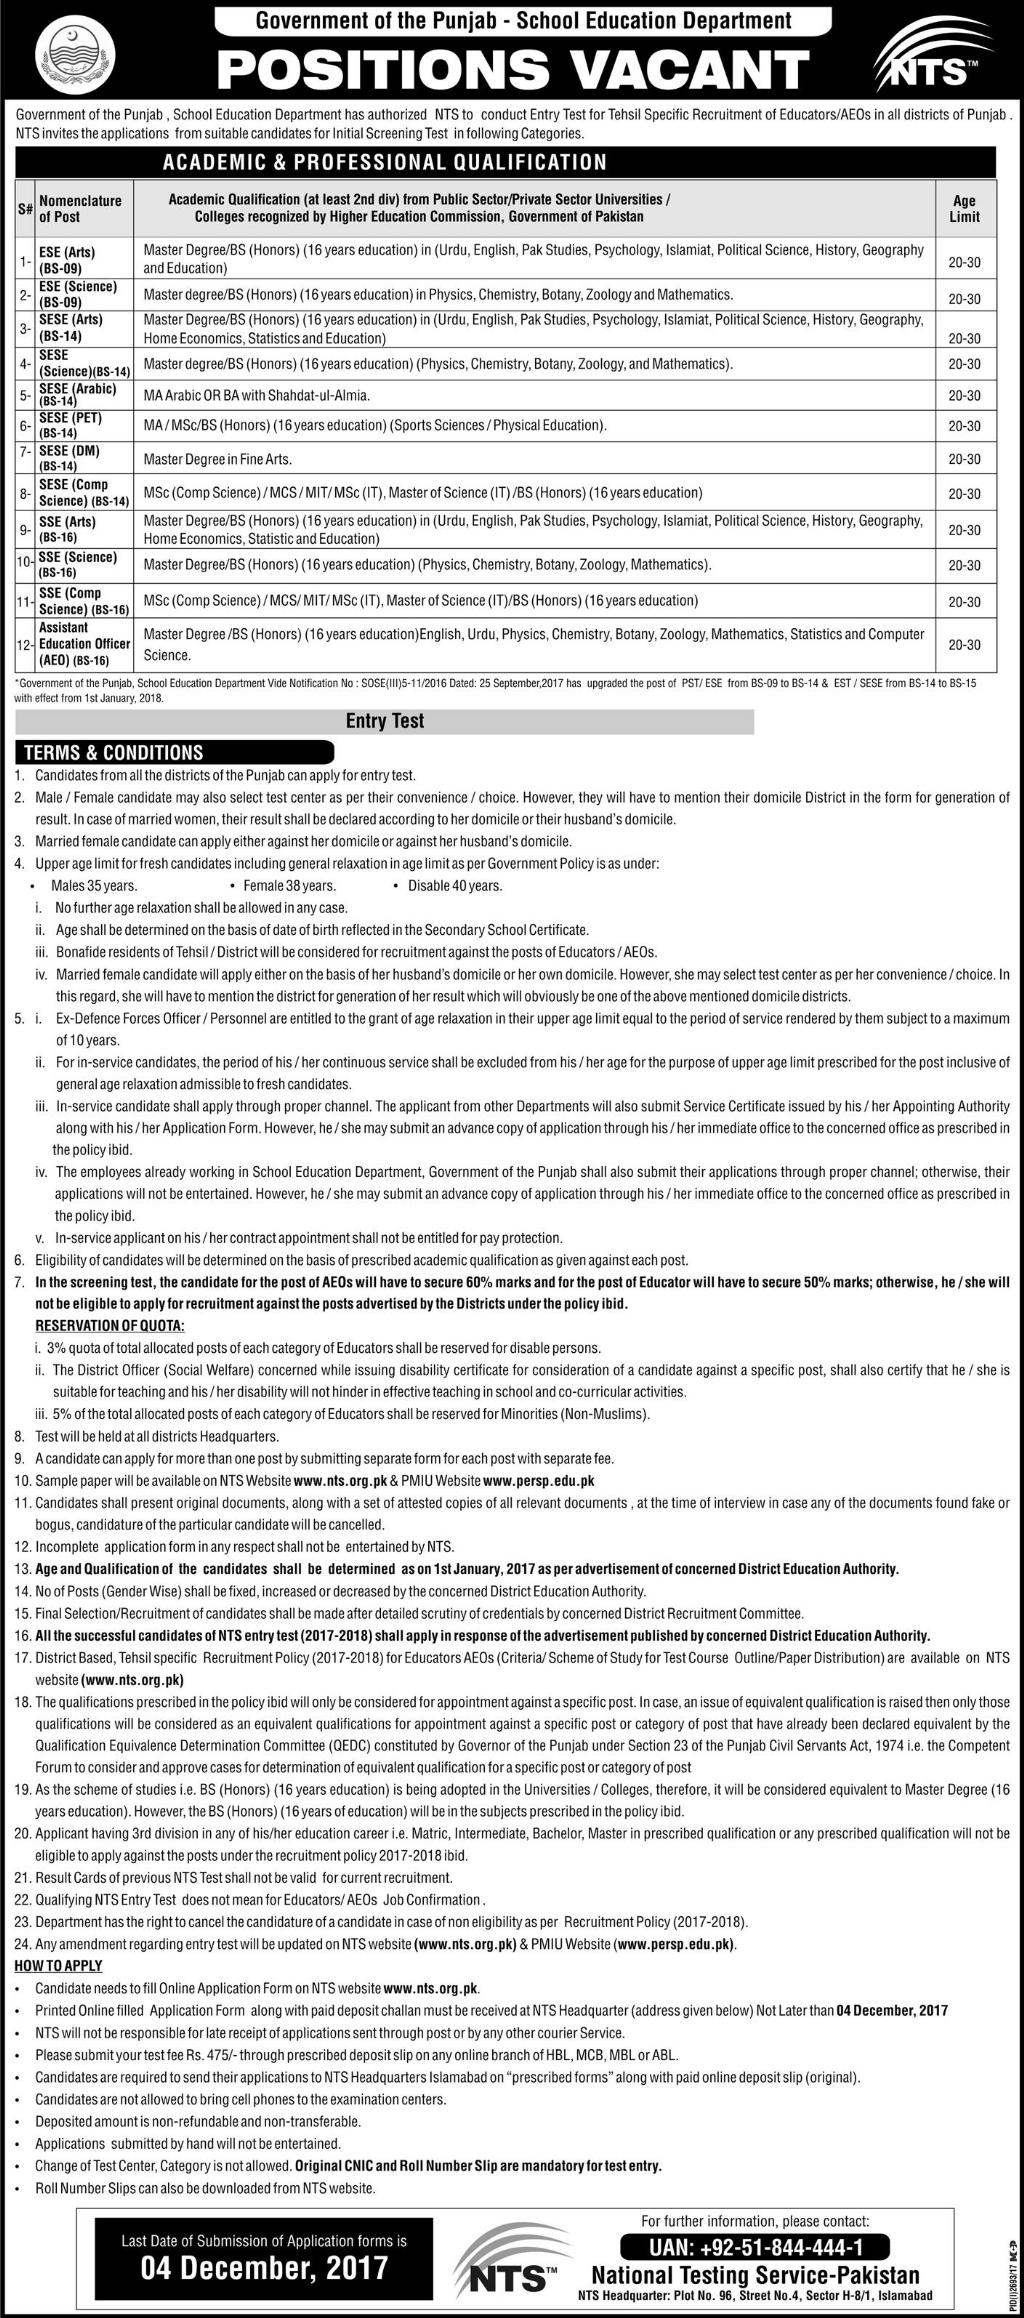 School Education Department Punjab Educators Jobs Express Newspaper 18th November, 2017